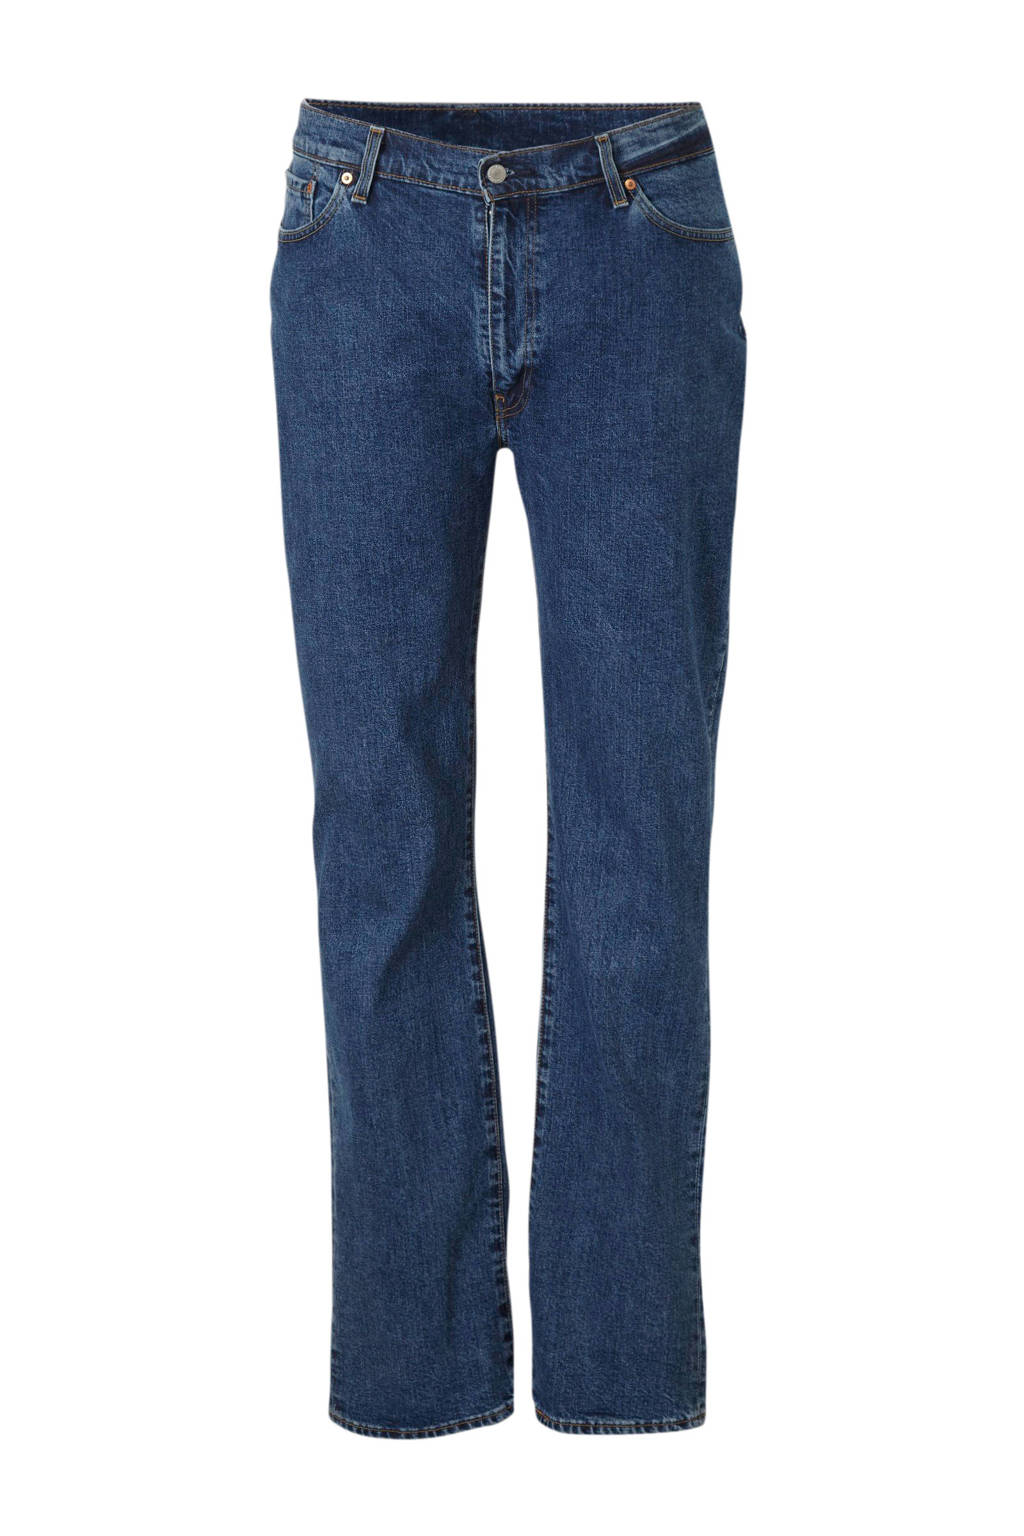 Levi's Big and Tall straight fit jeans 514 stonewash stretch, STONEWASH STRETCH